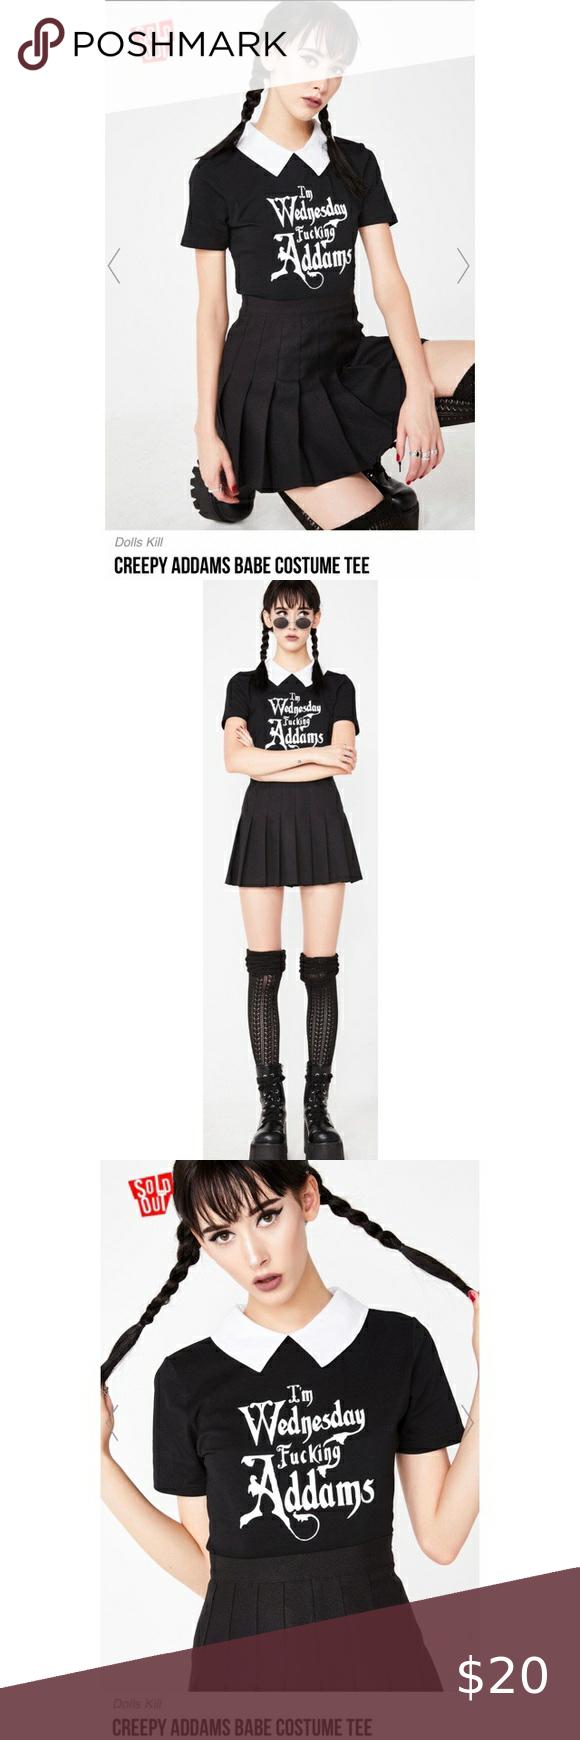 Dolls Kill Halloween Top Size Medium in 2020 Costume